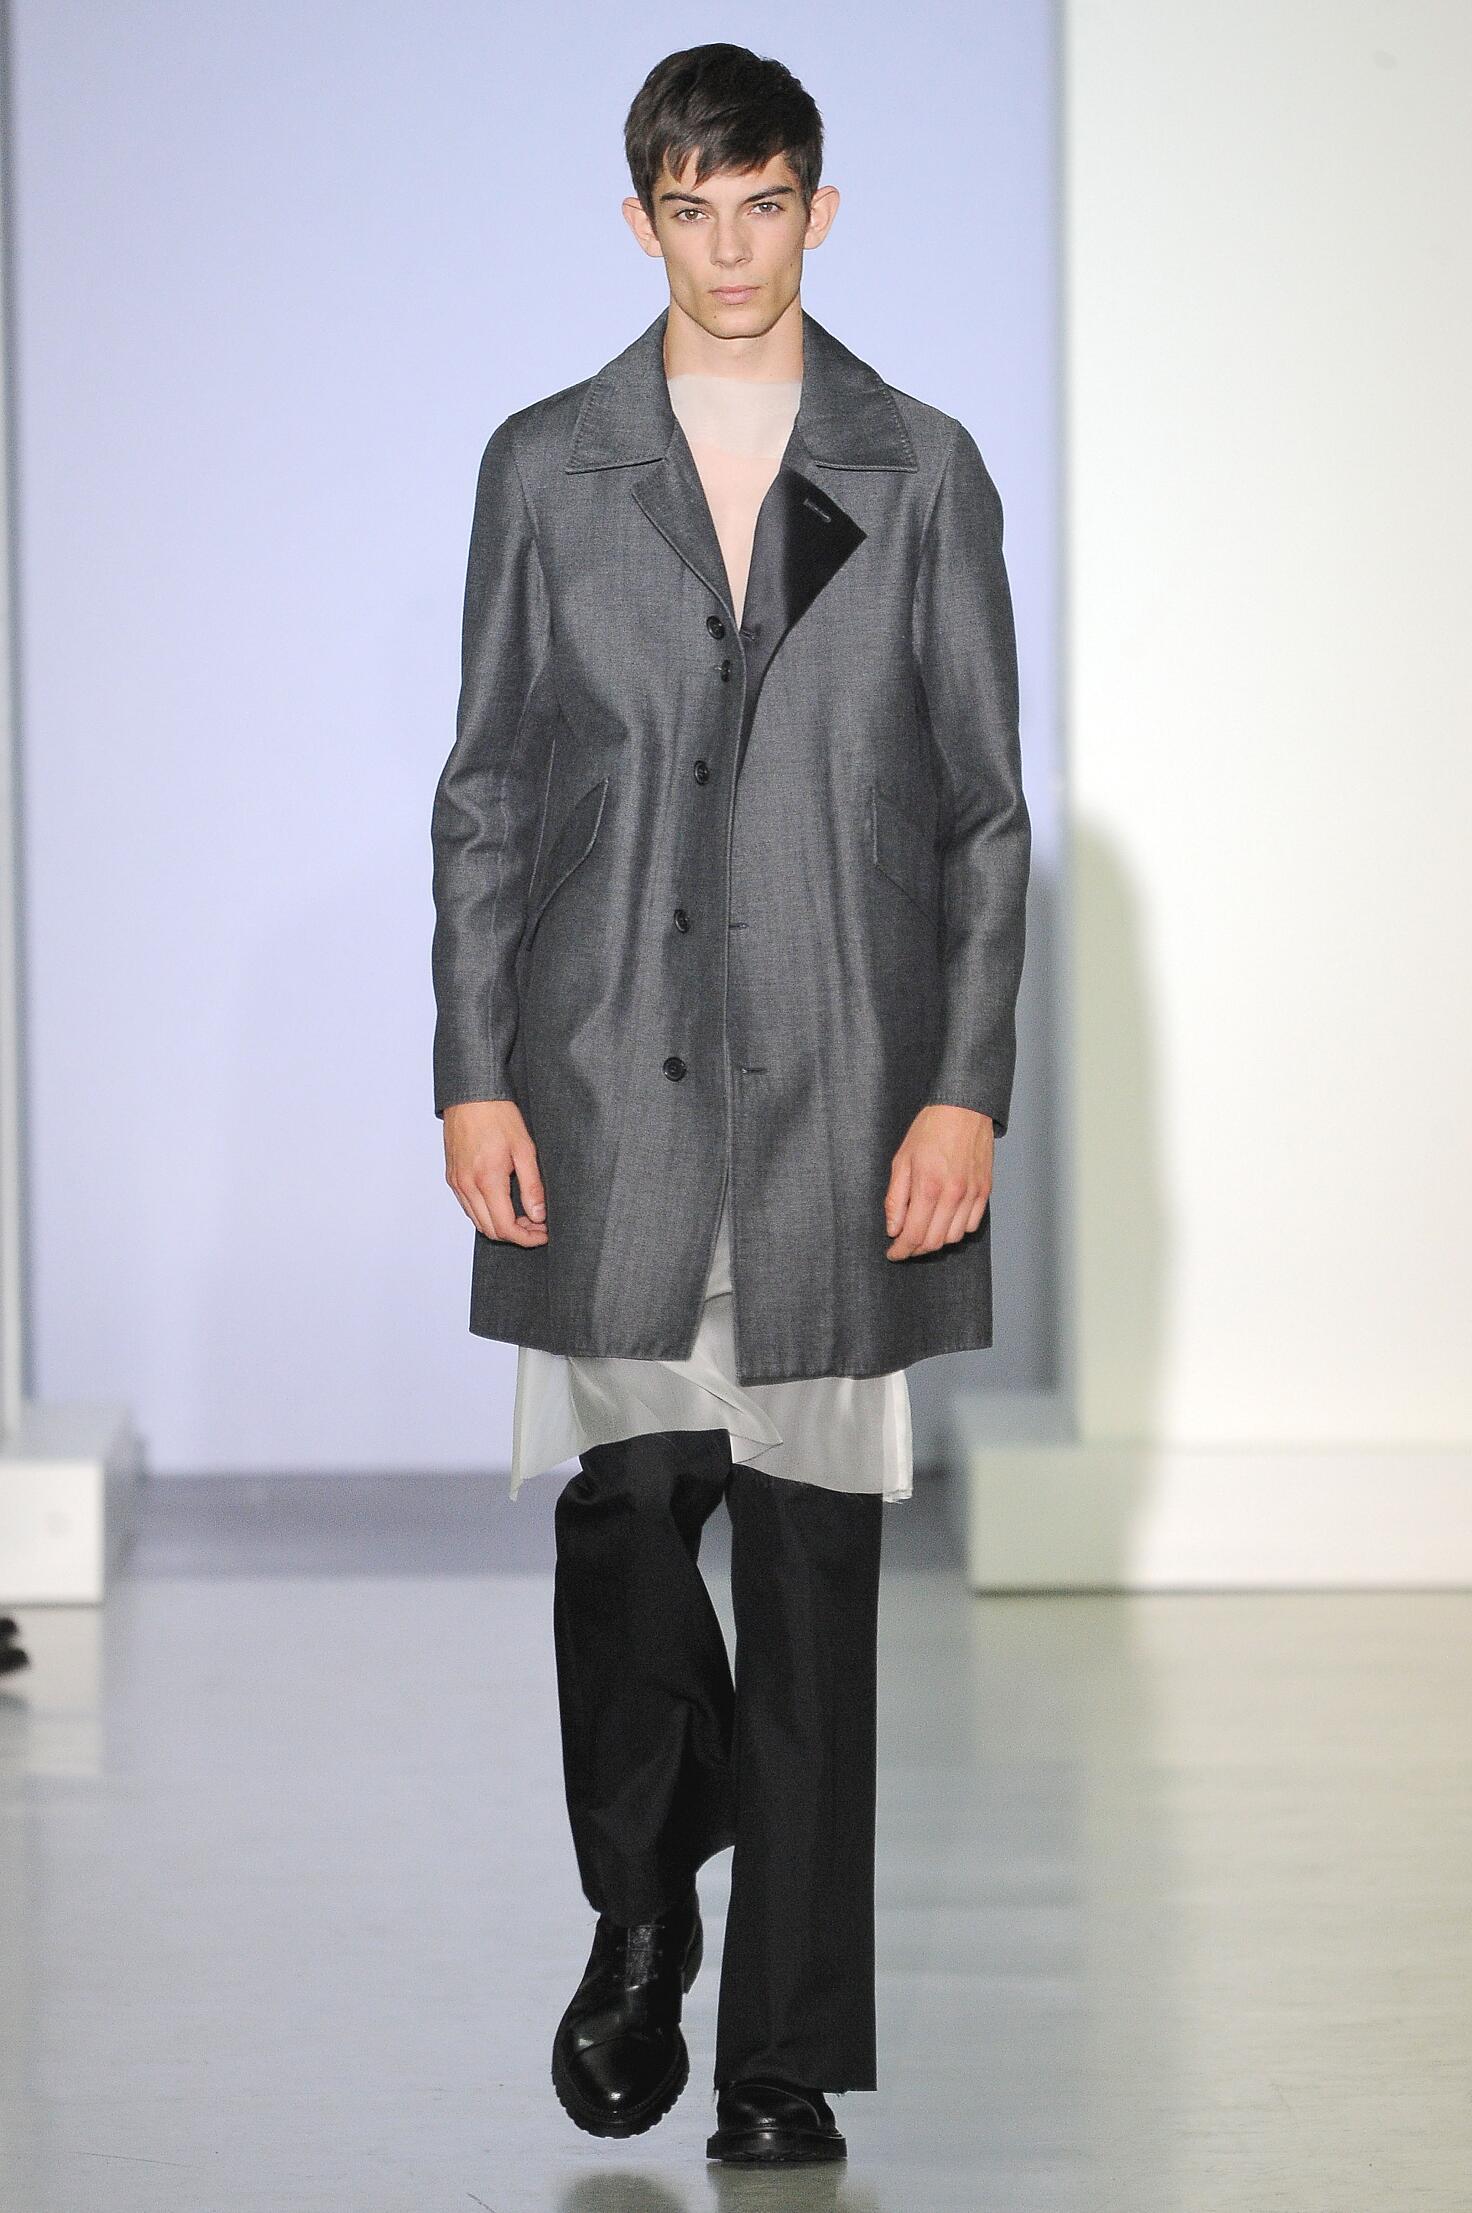 Spring 2015 Fashion Trends Yang Li